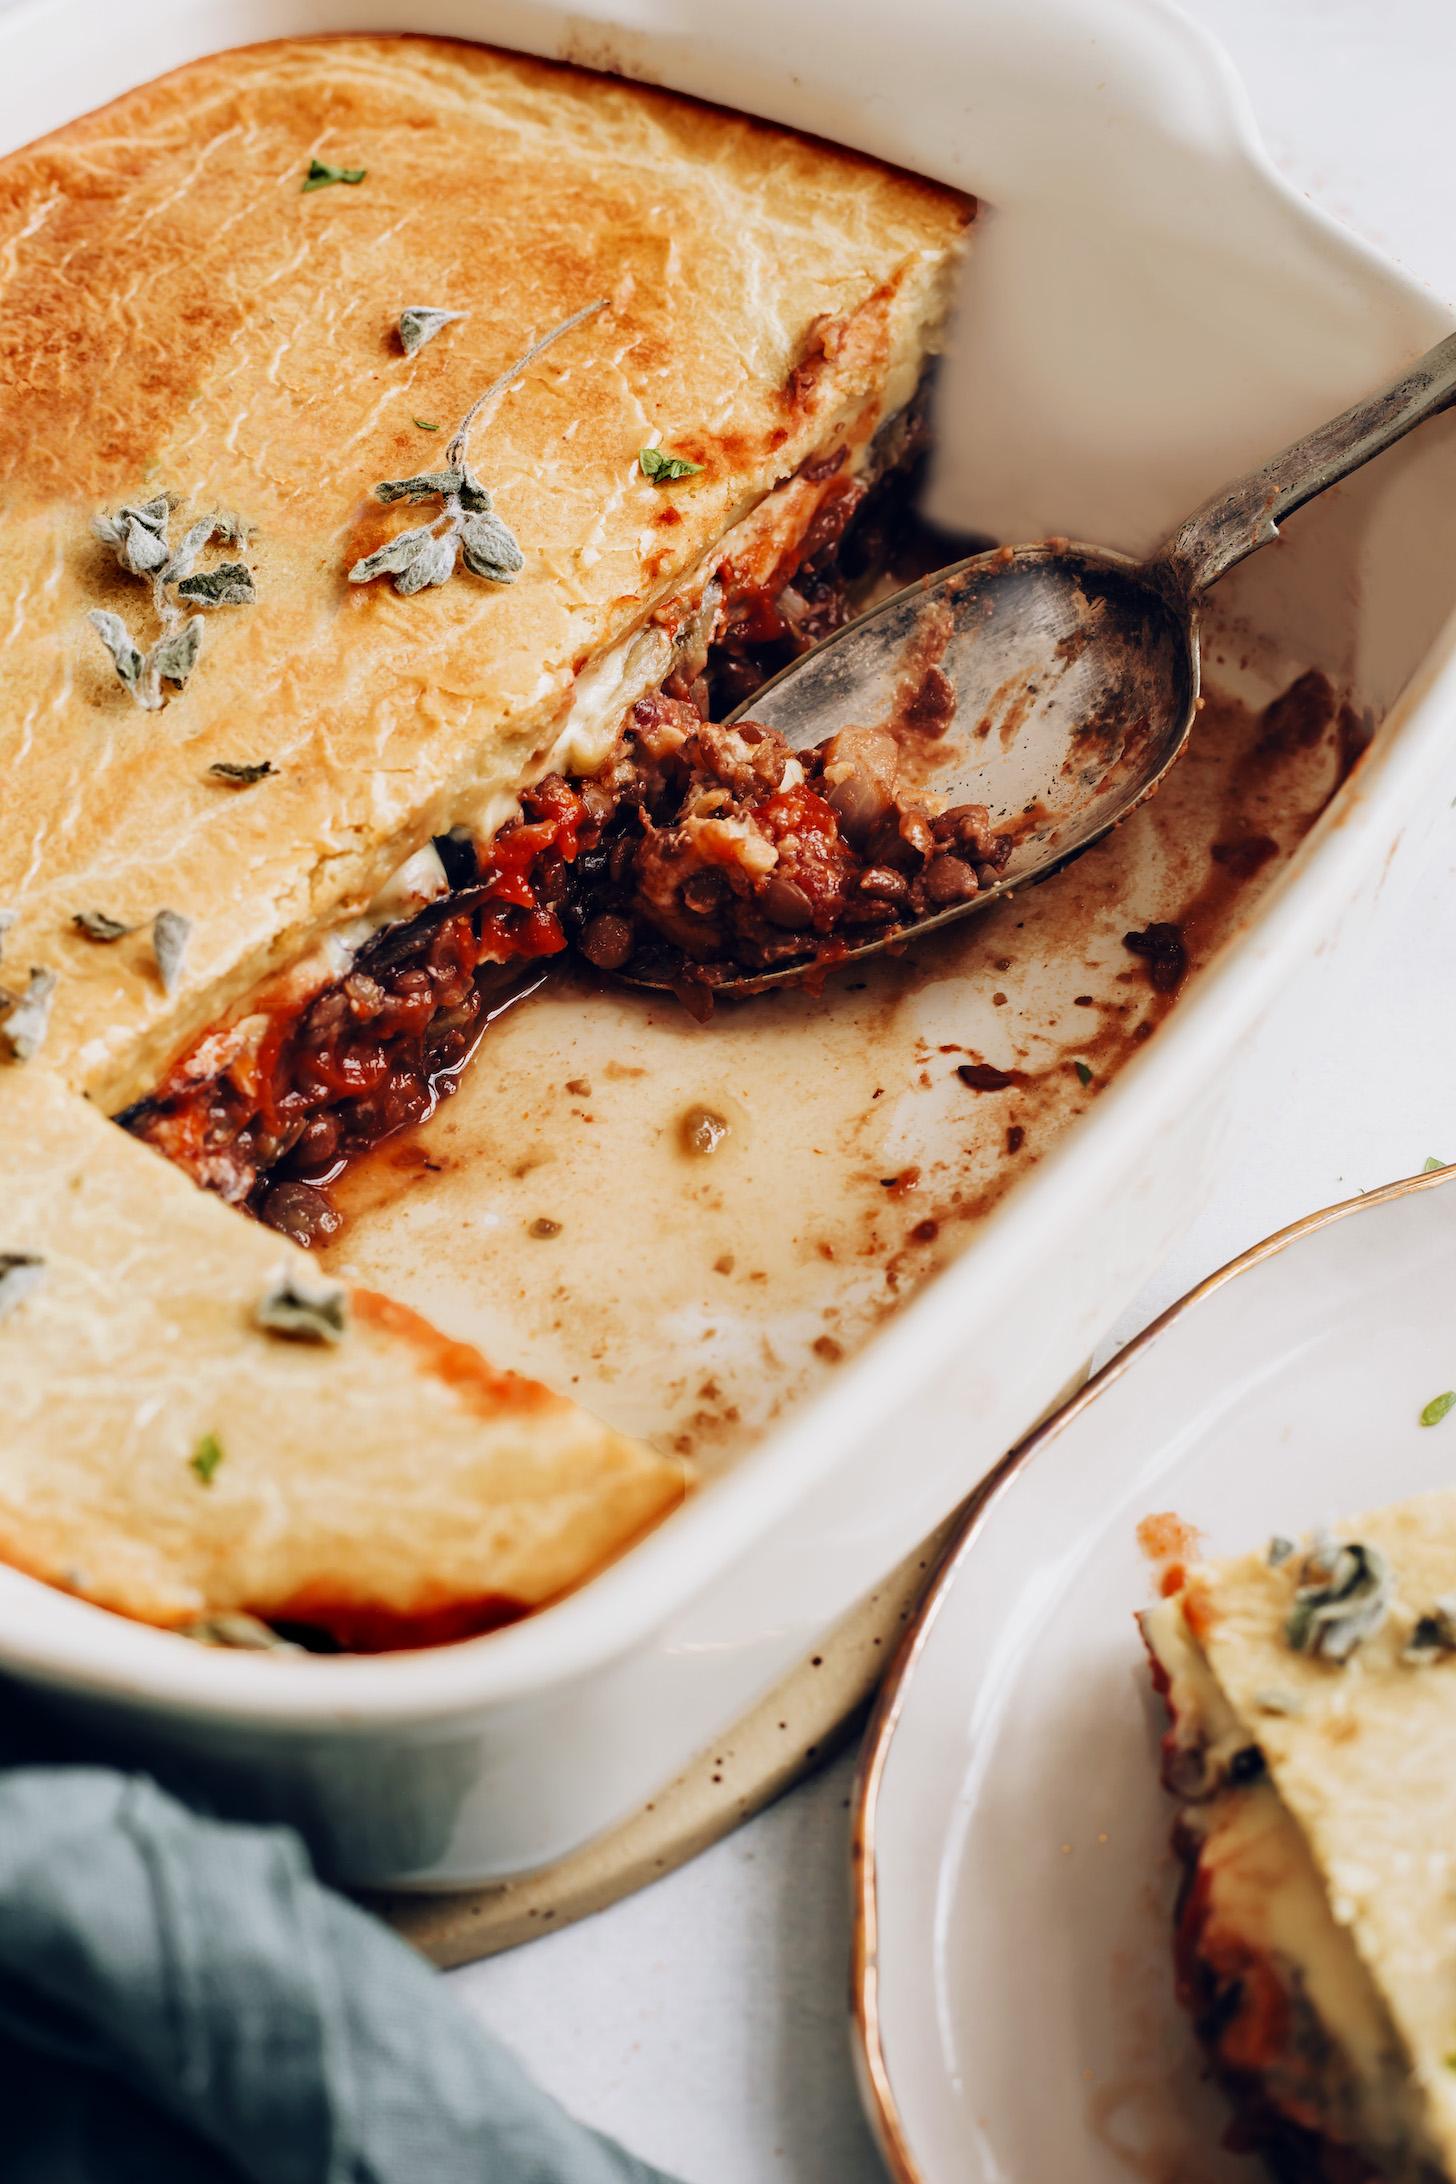 Vintage spoon in a pan of easy vegan moussaka